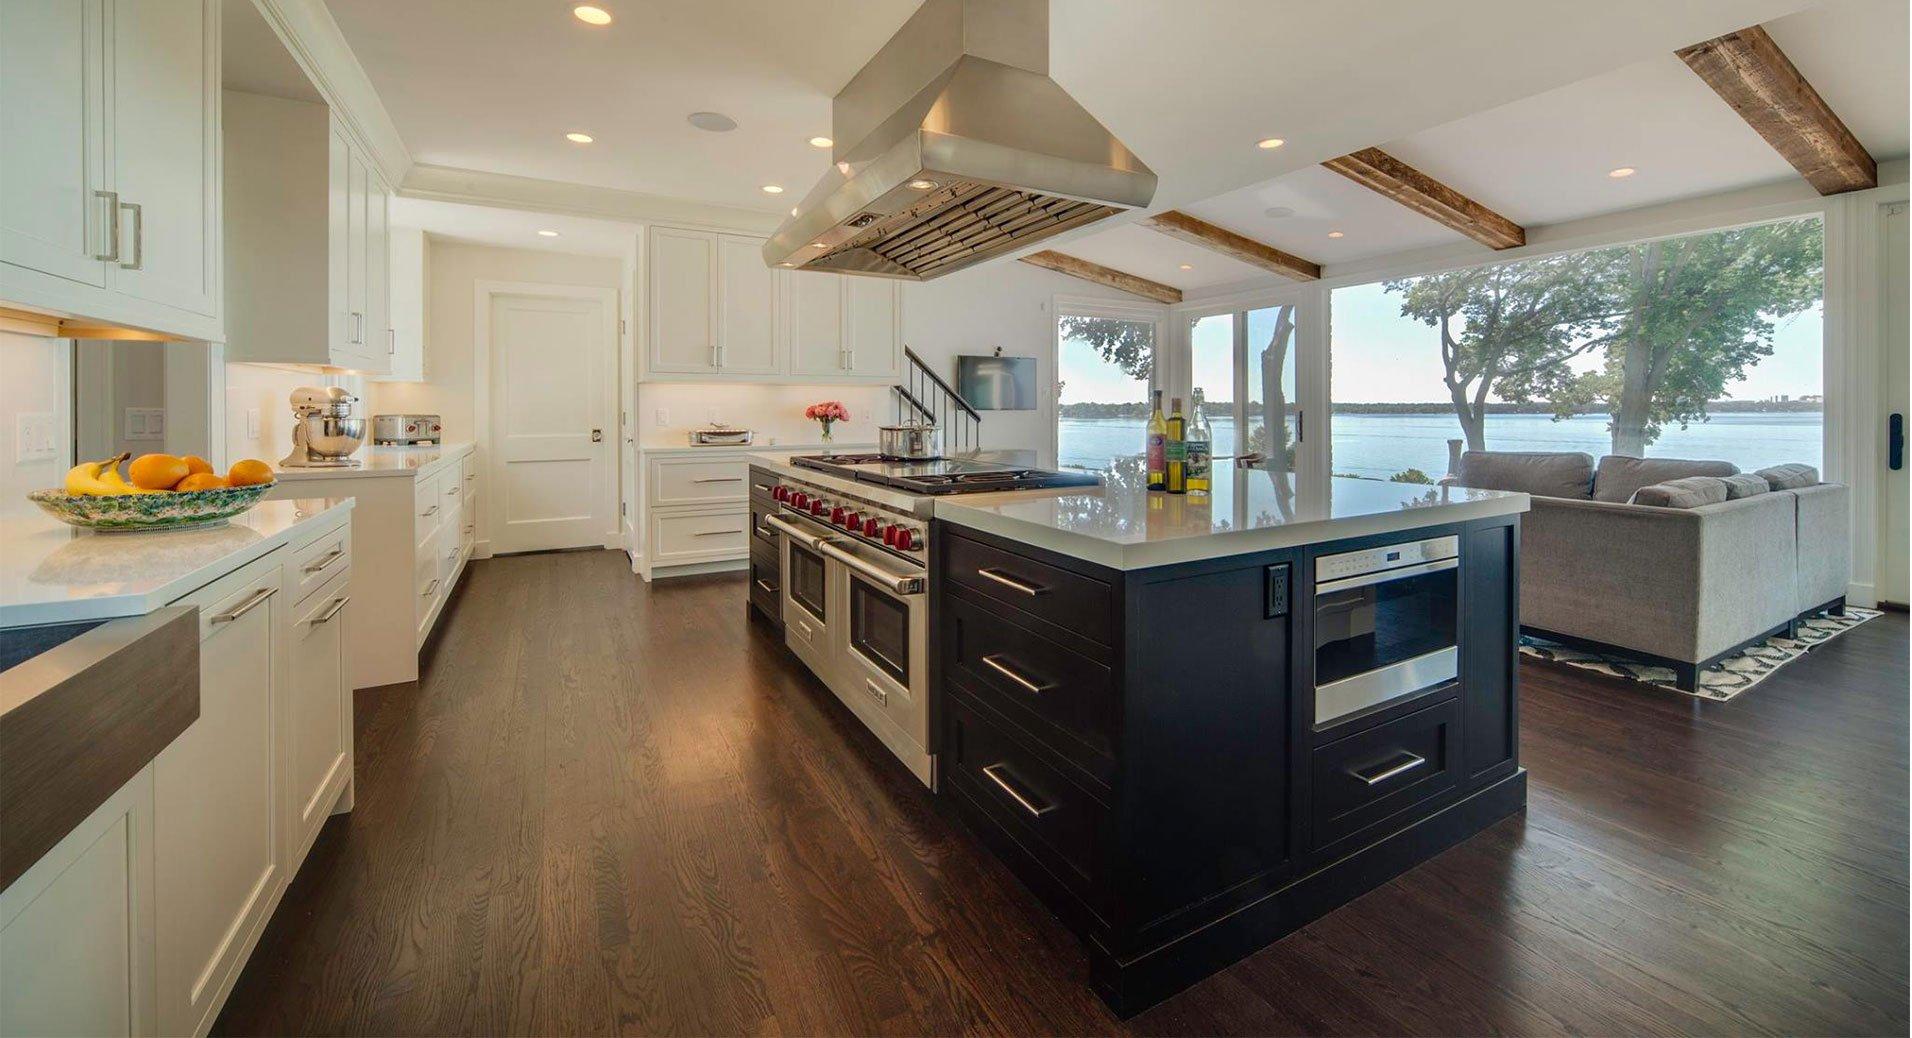 Kitchen Cabinets And Bathroom Design Longwood Florida